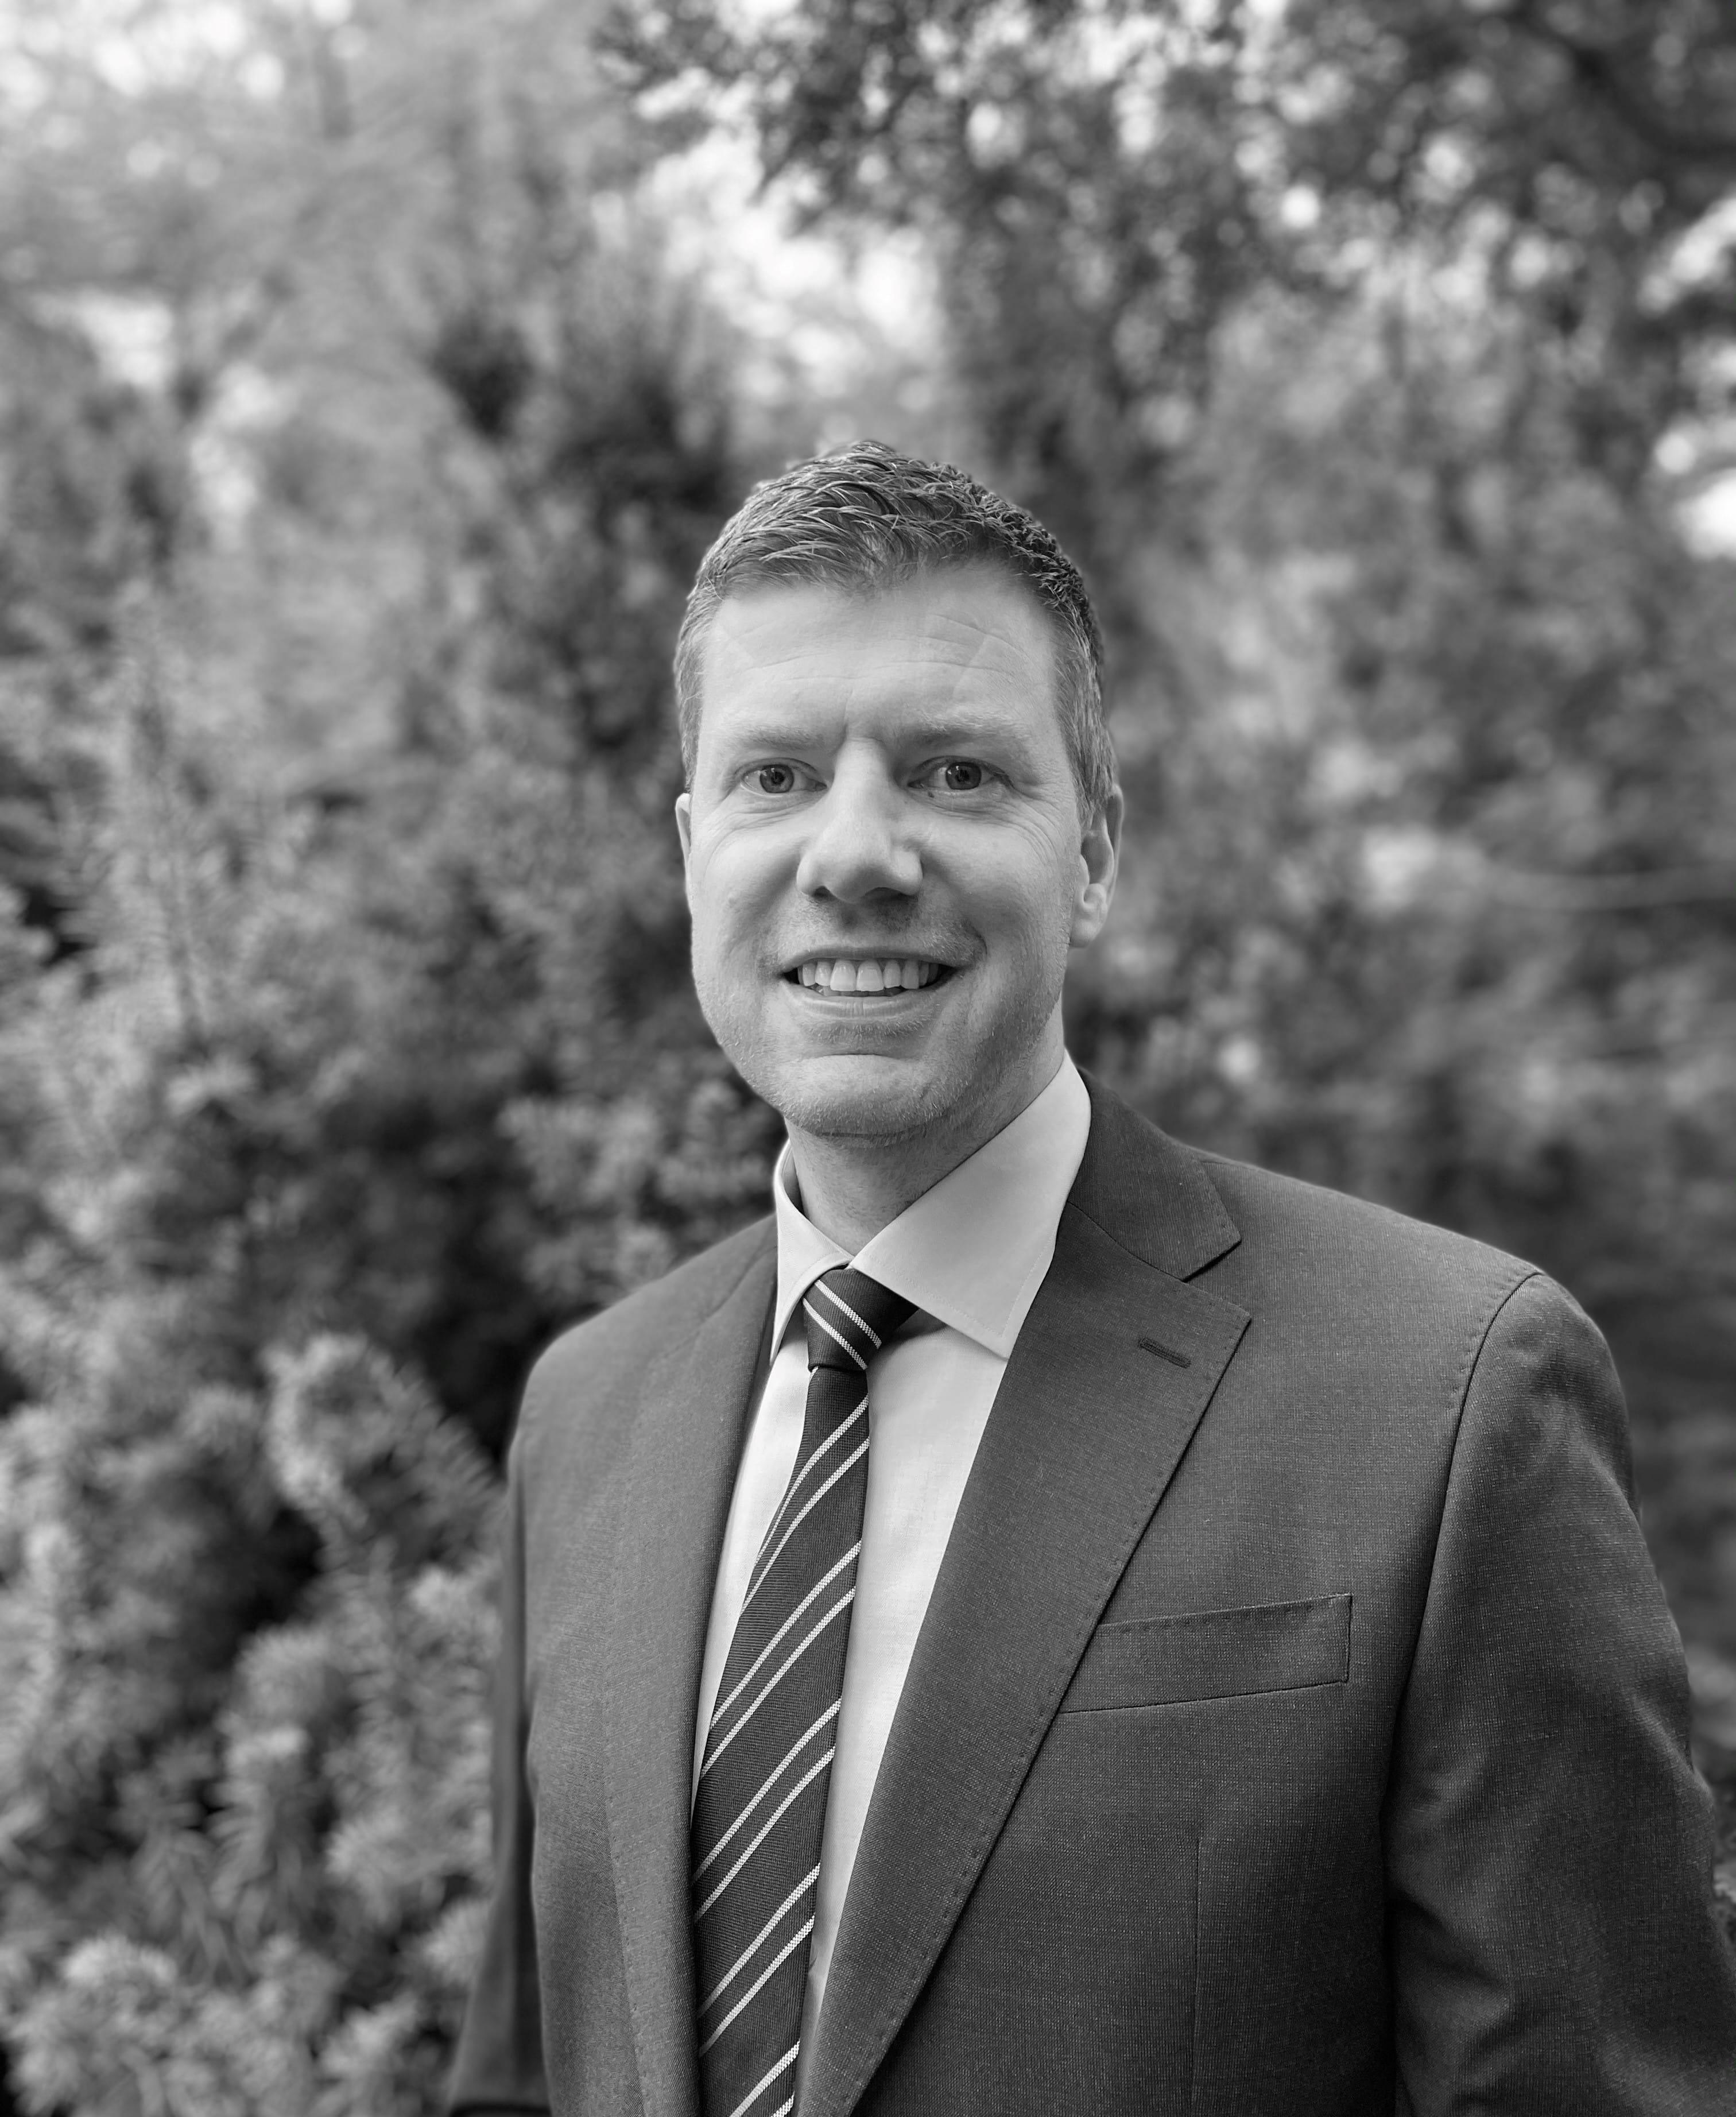 Peder Reinewald Hansen, Head of Asset Projects & Technology, Hydrogen at Ørsted